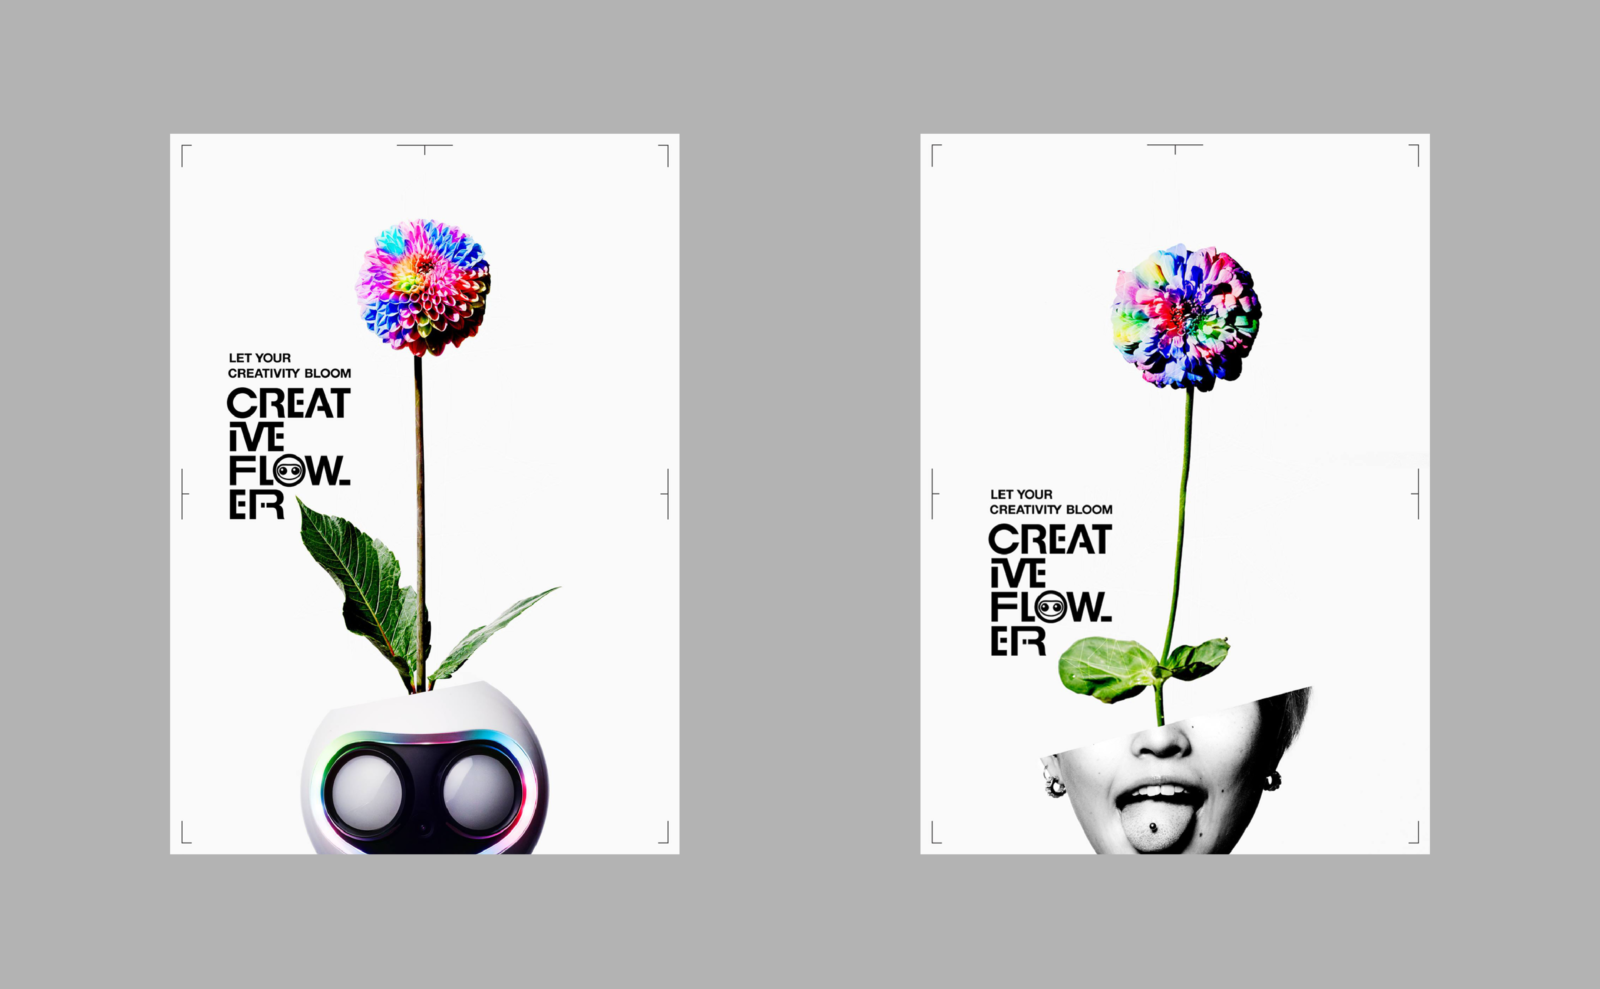 CREATIVE FLOW_ER__-5